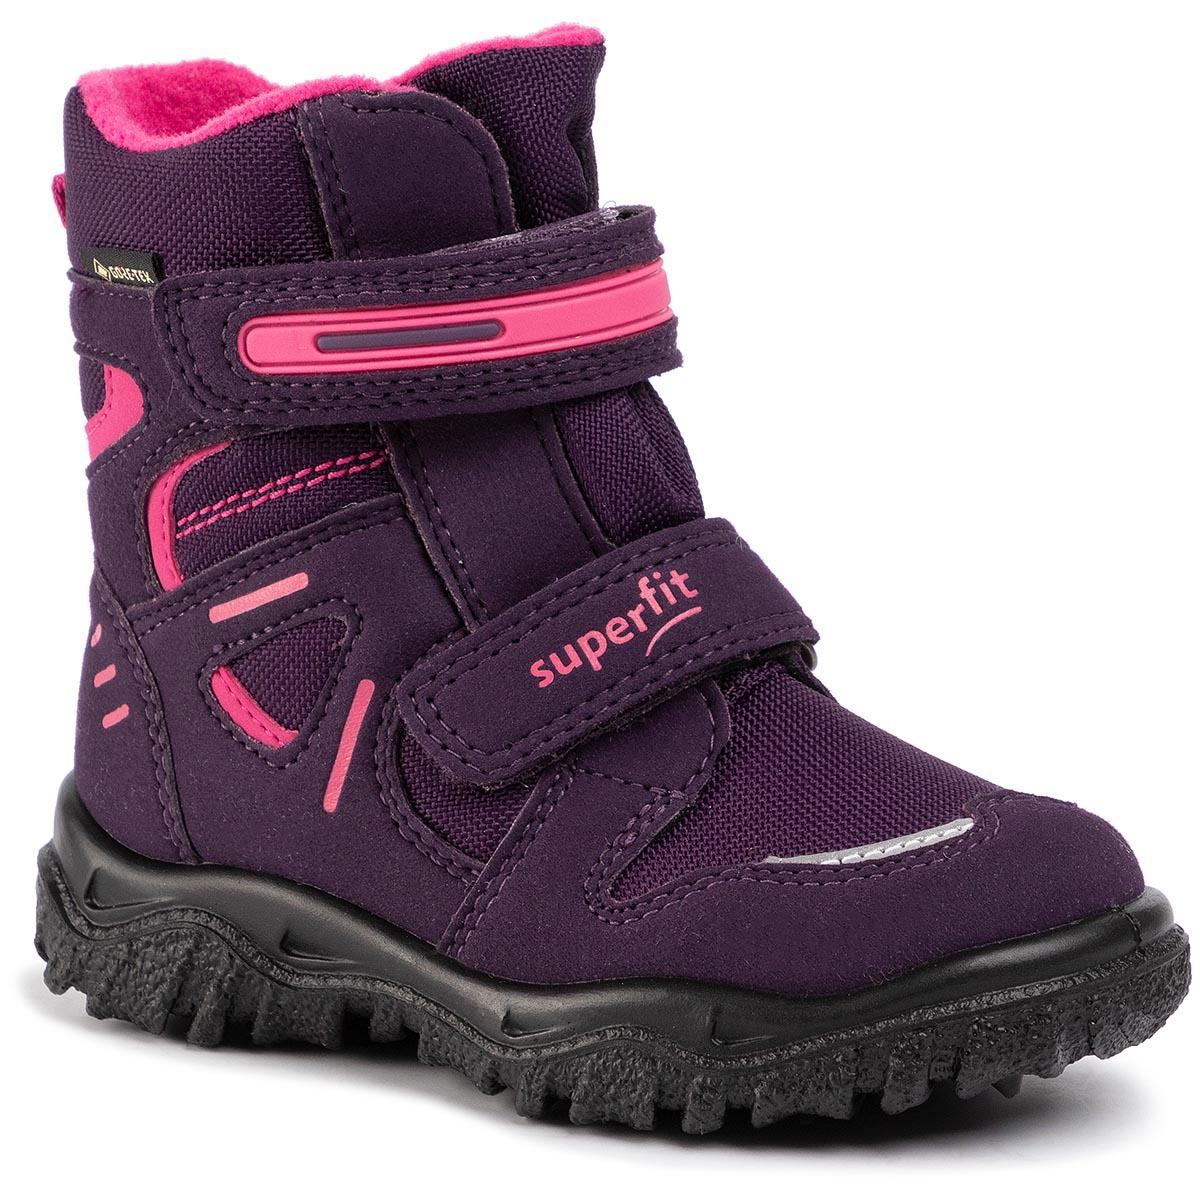 Snow Boots SUPERFIT GORE TEX 1 00044 81 Ocean Kombi